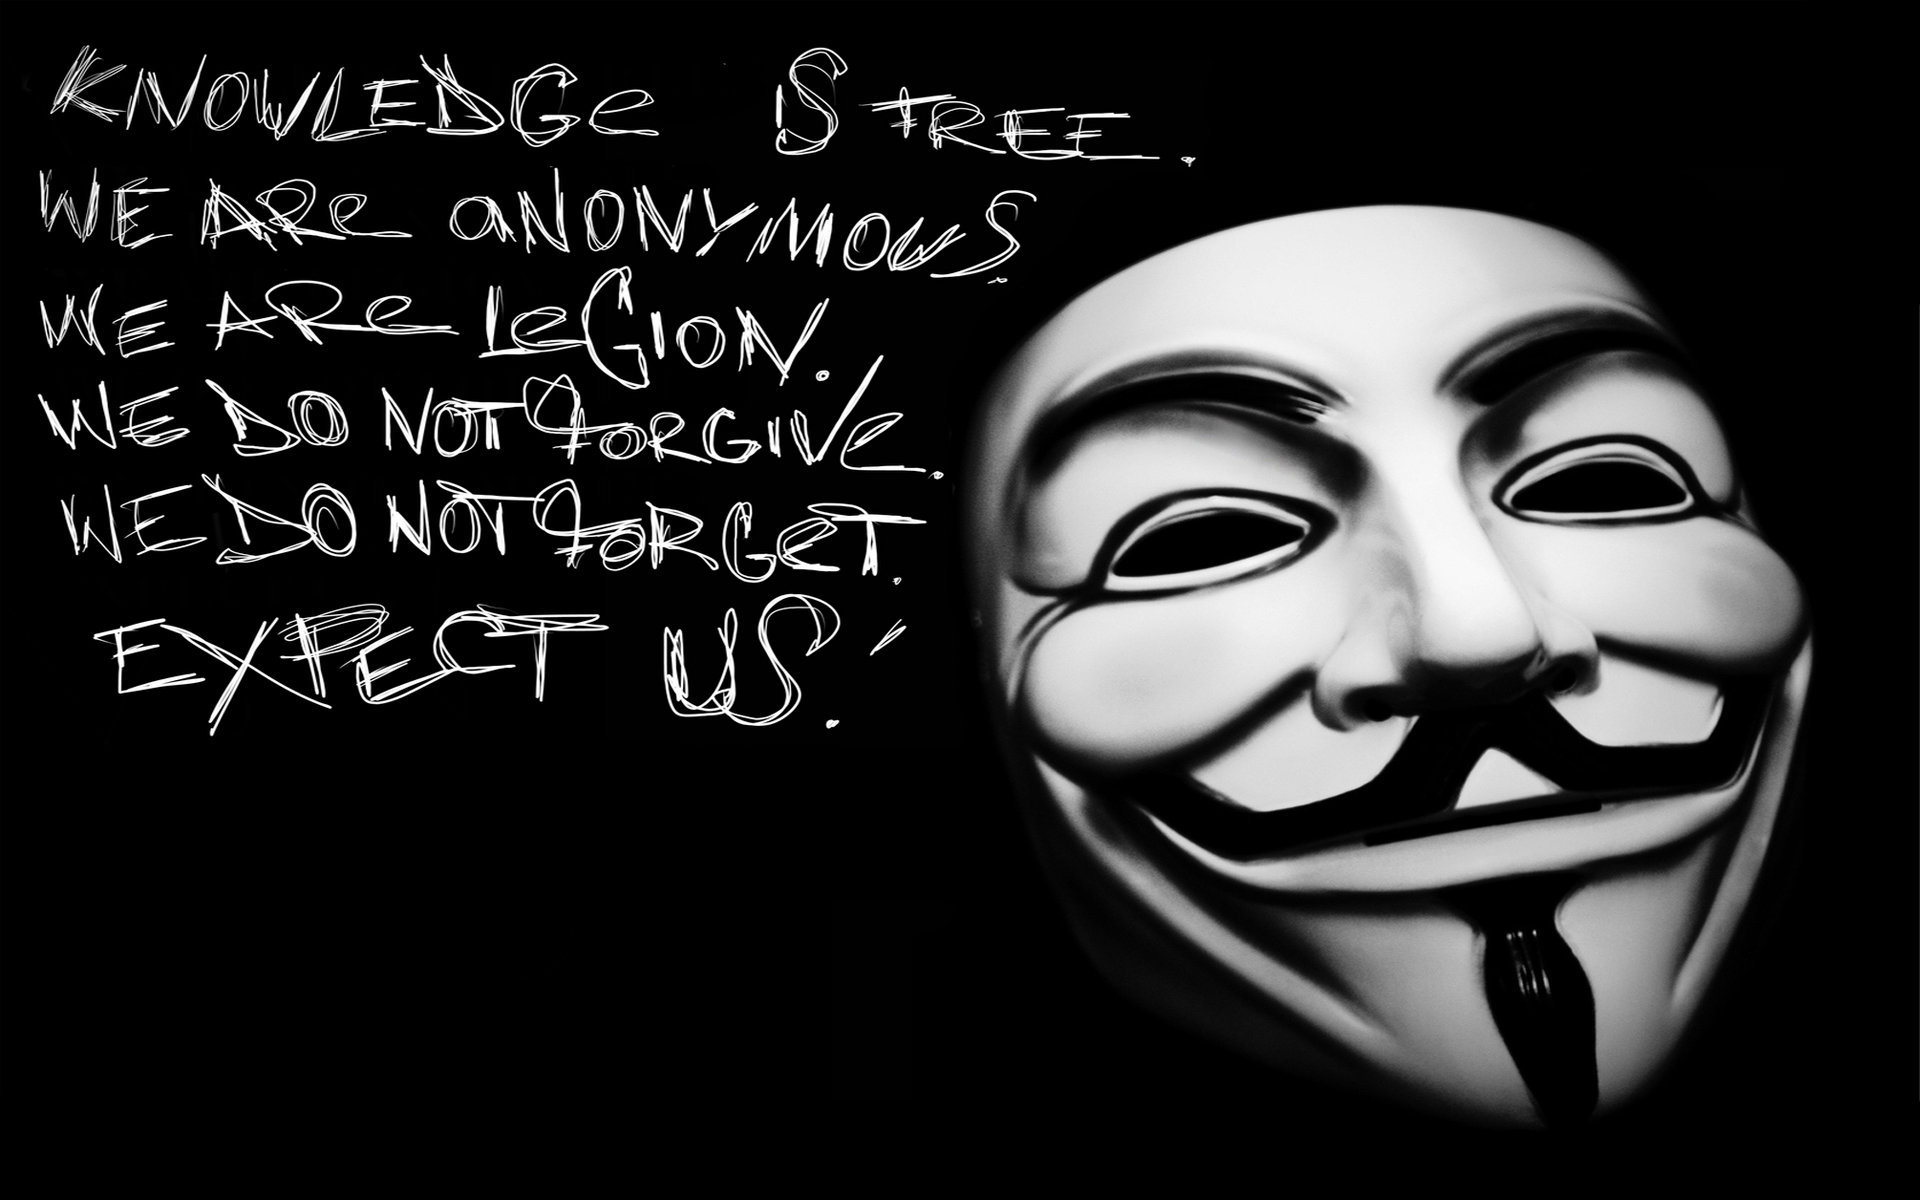 anonymous wallpaper hdjpg 1920x1200